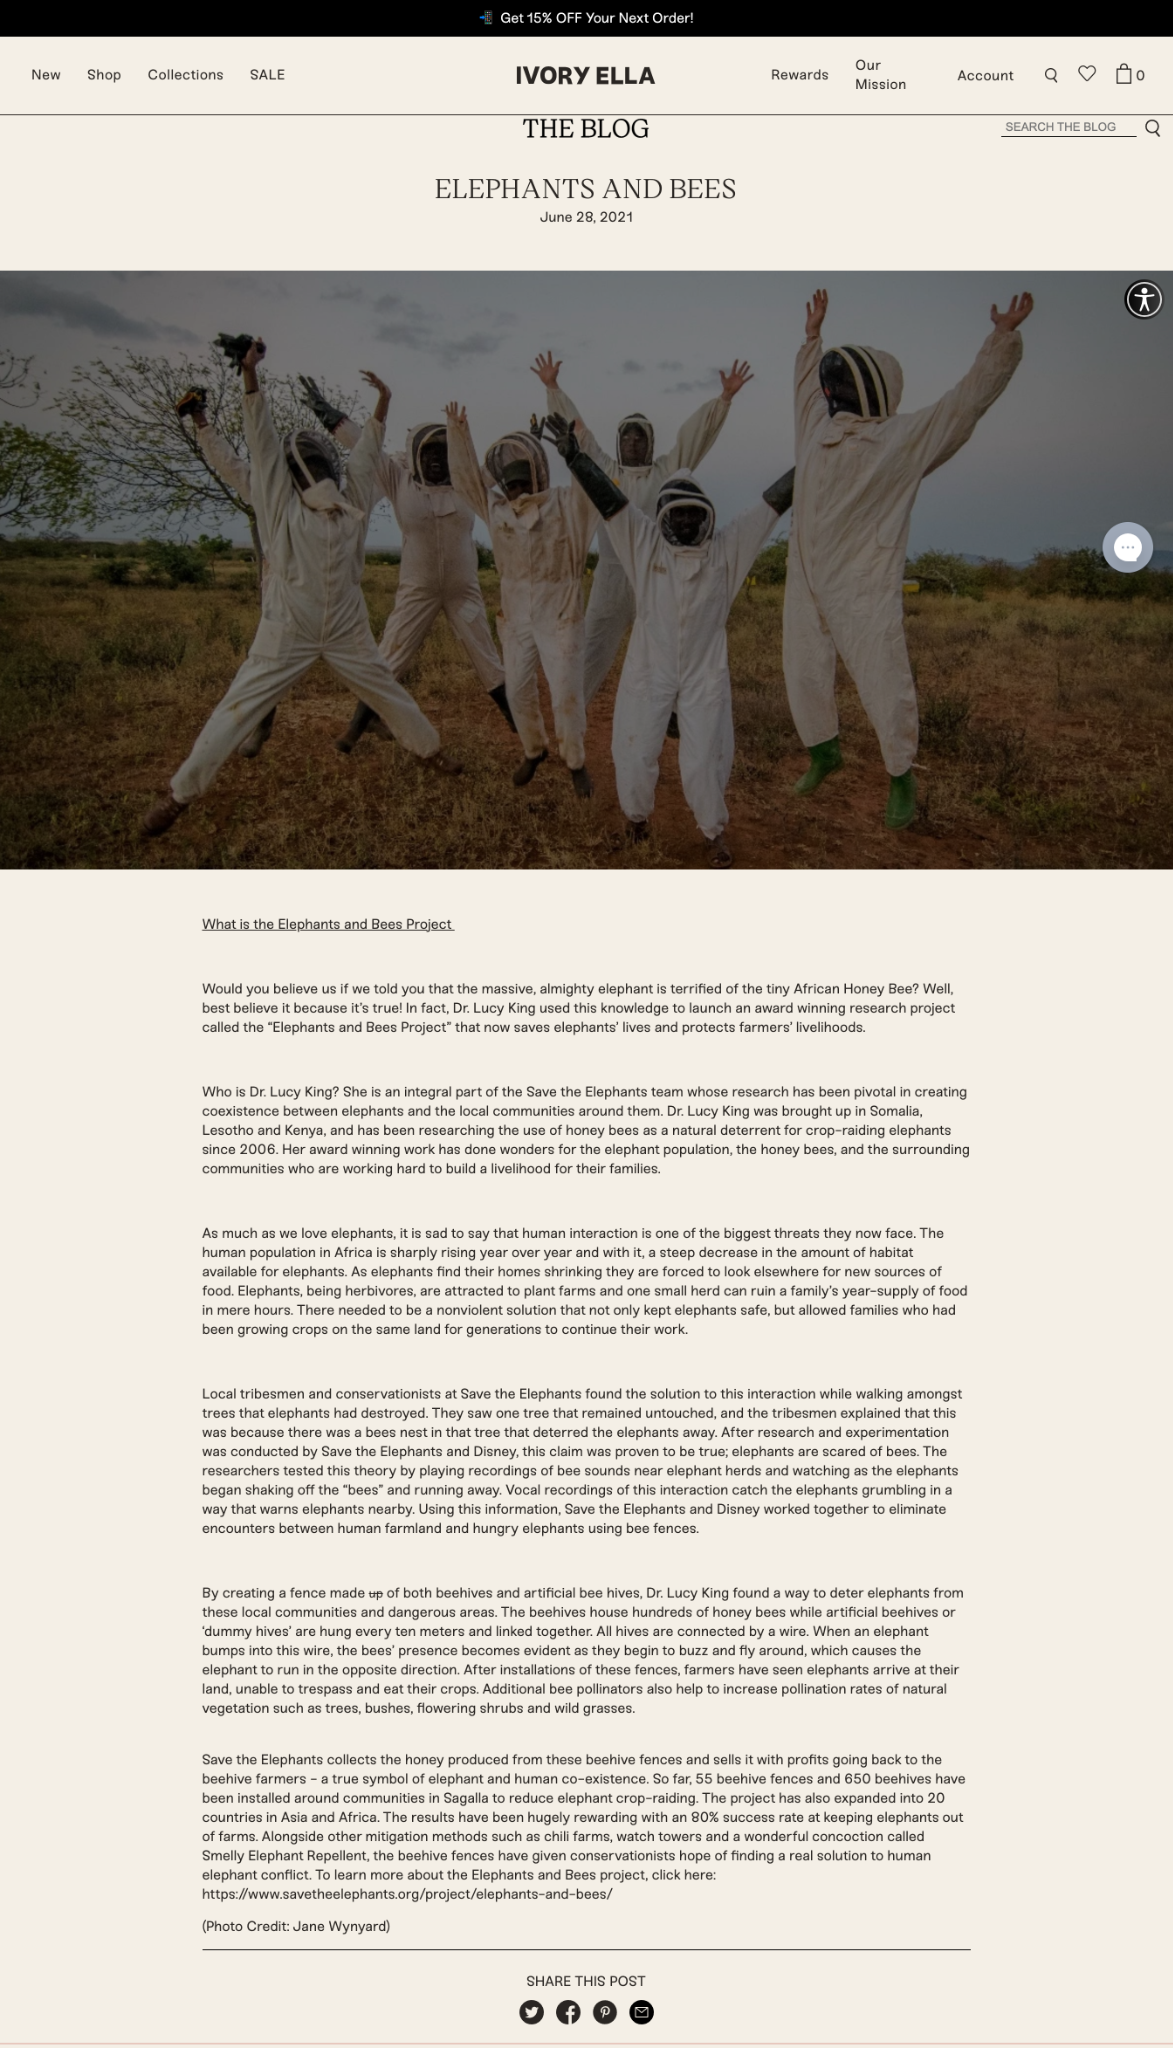 Ivory Ella's Blog - Elephant and Bees post